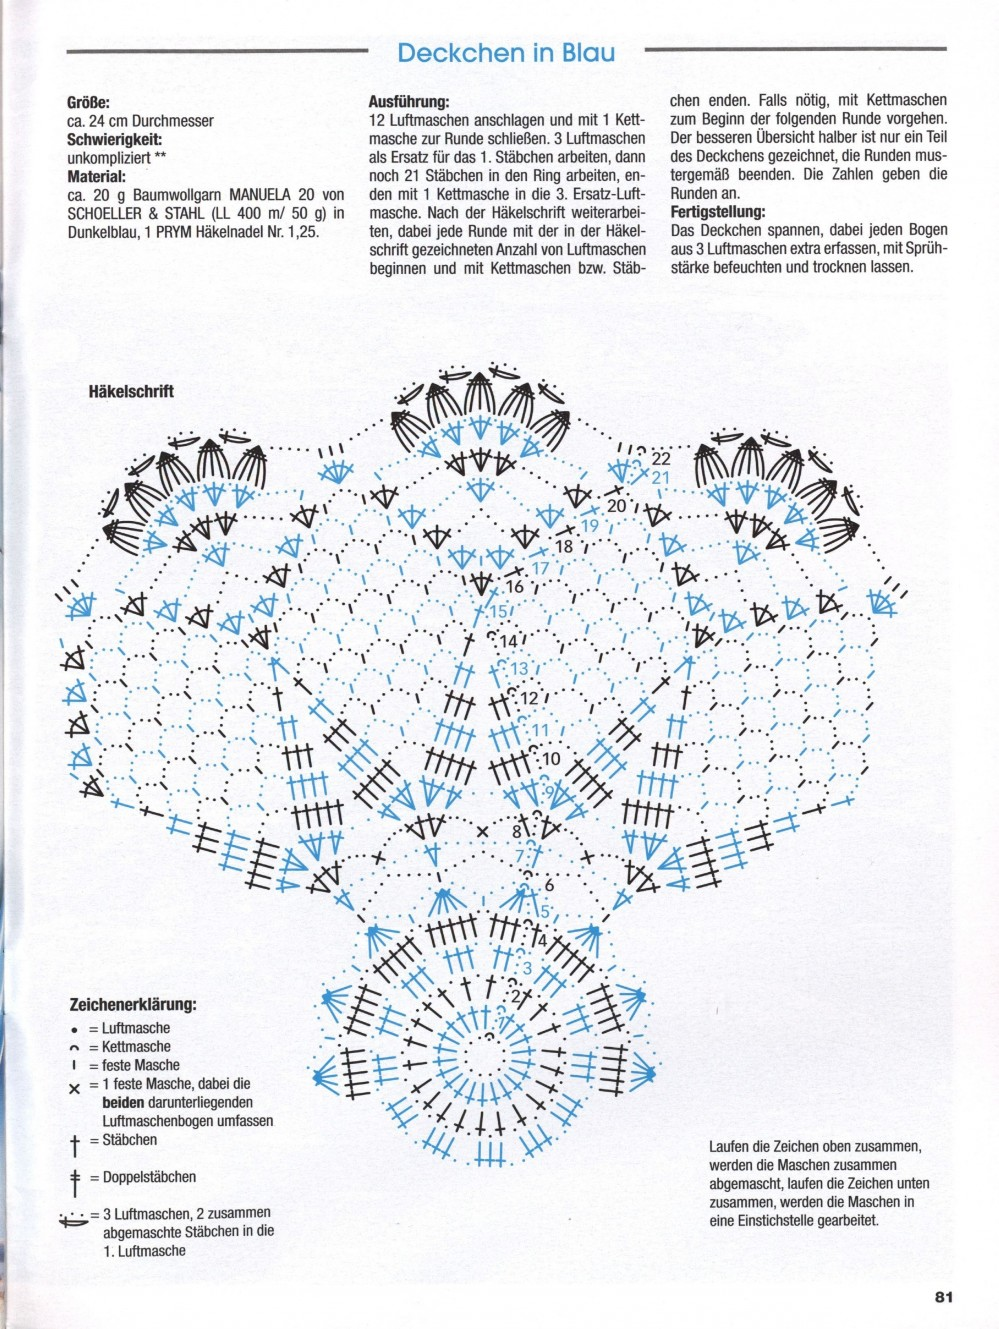 81.jpg#utm_source=googlier.com/page/2019_10_08/751&utm_campaign=link&utm_term=googlier&utm_content=googlier.com